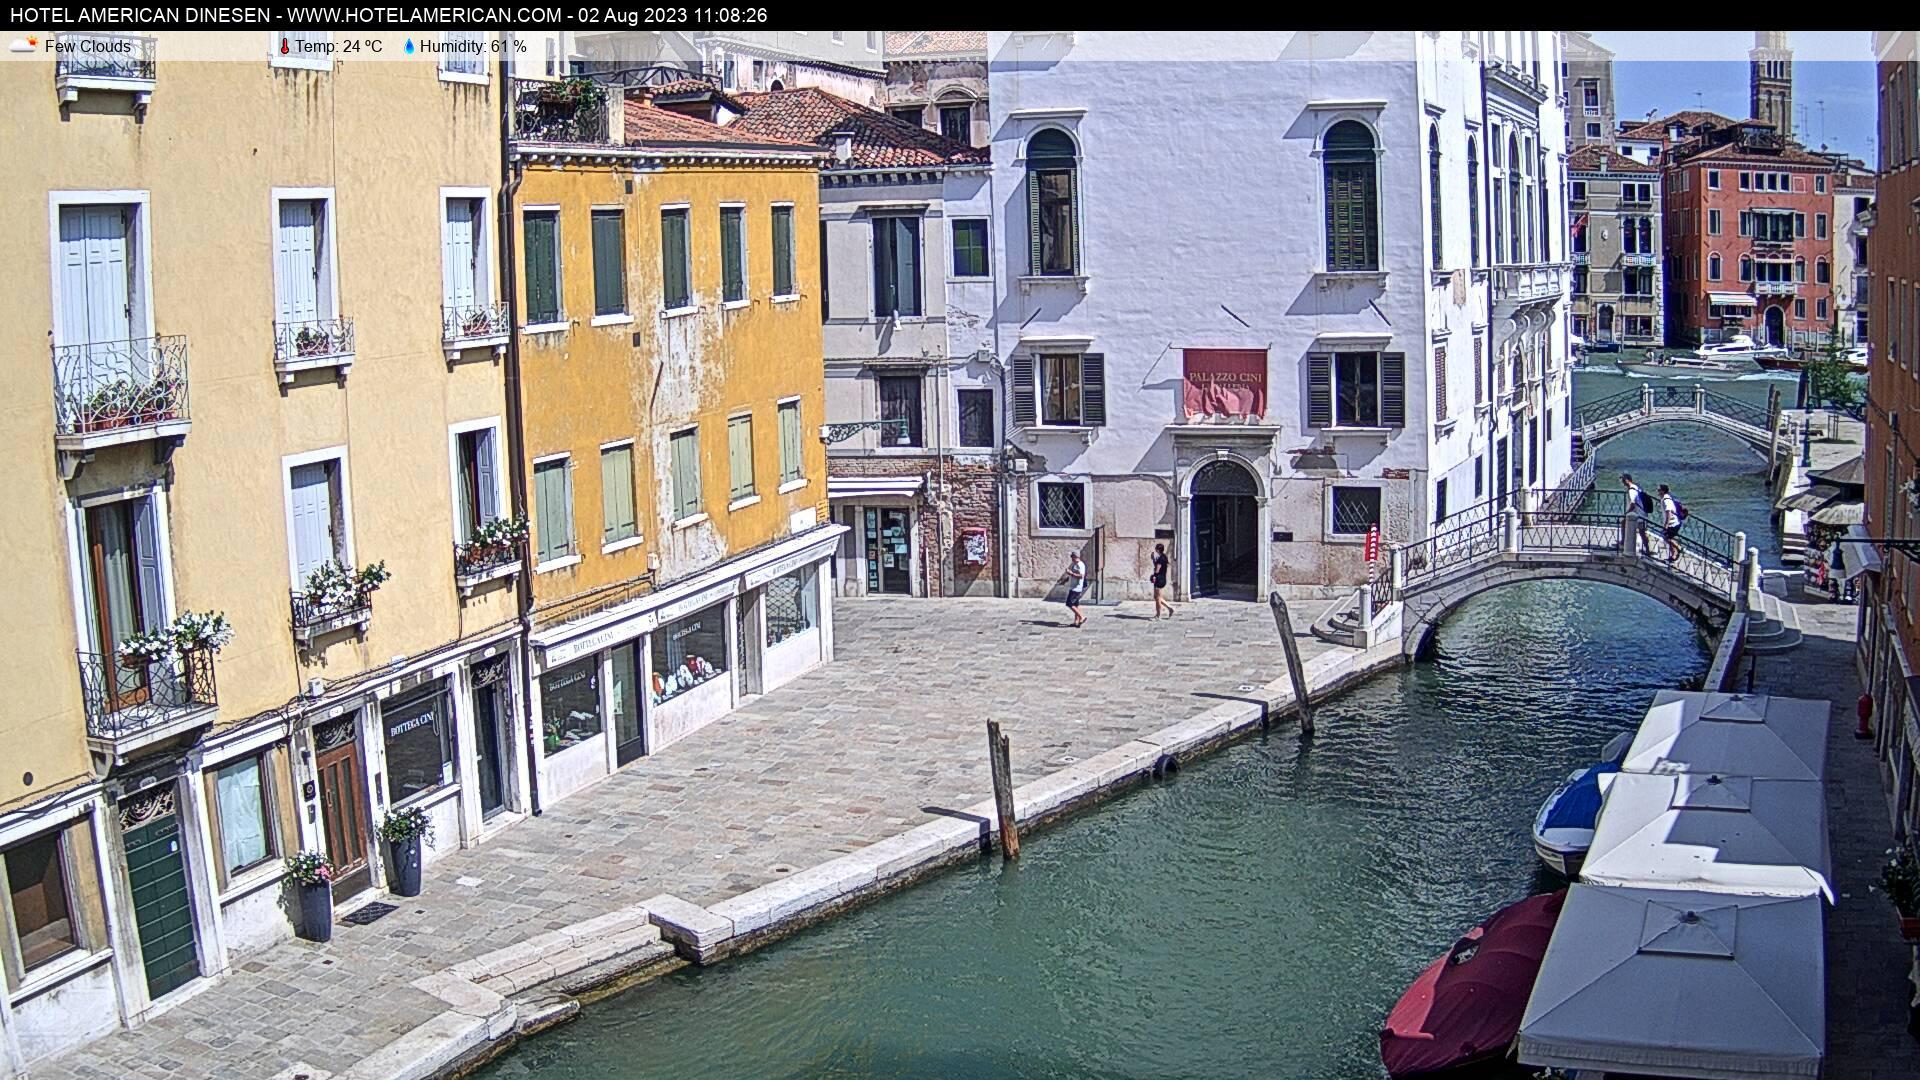 Venedig Sa. 11:08